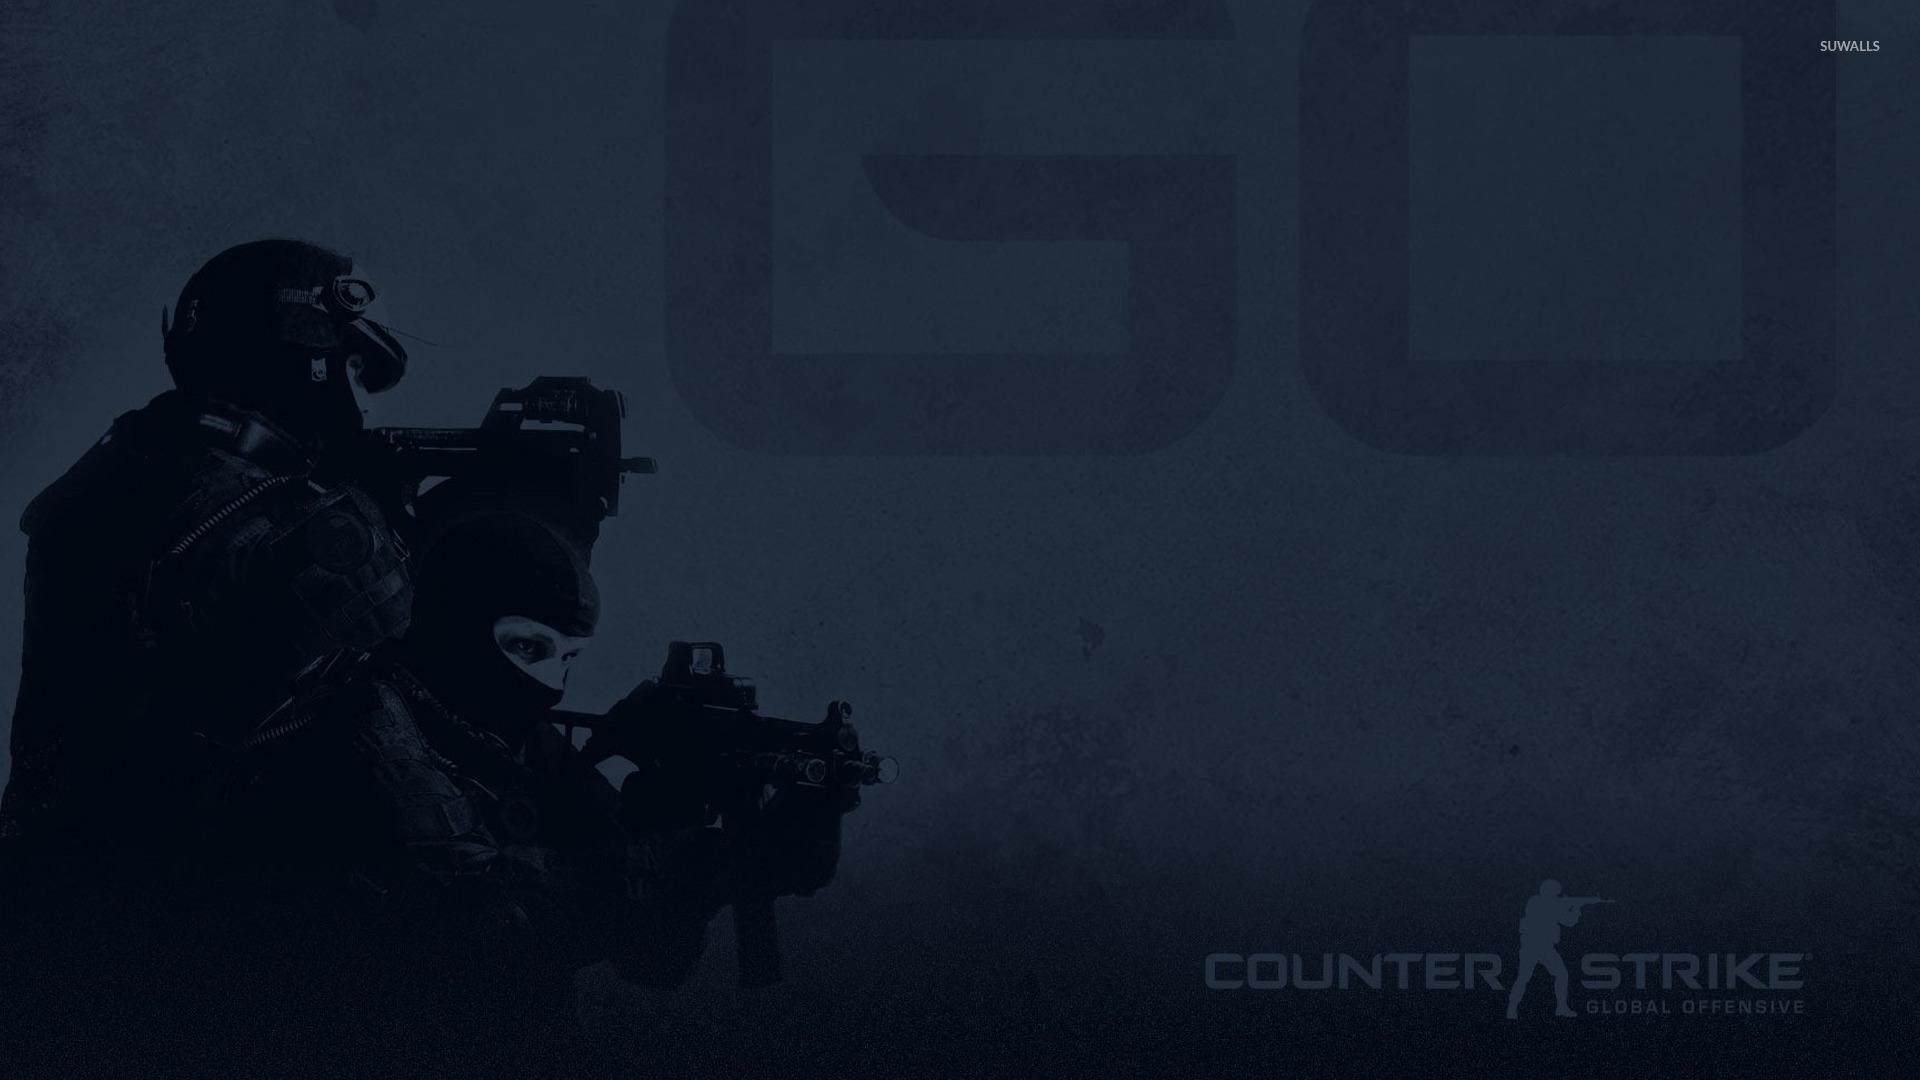 Counter-Strike: Global Offensive [7] Wallpaper